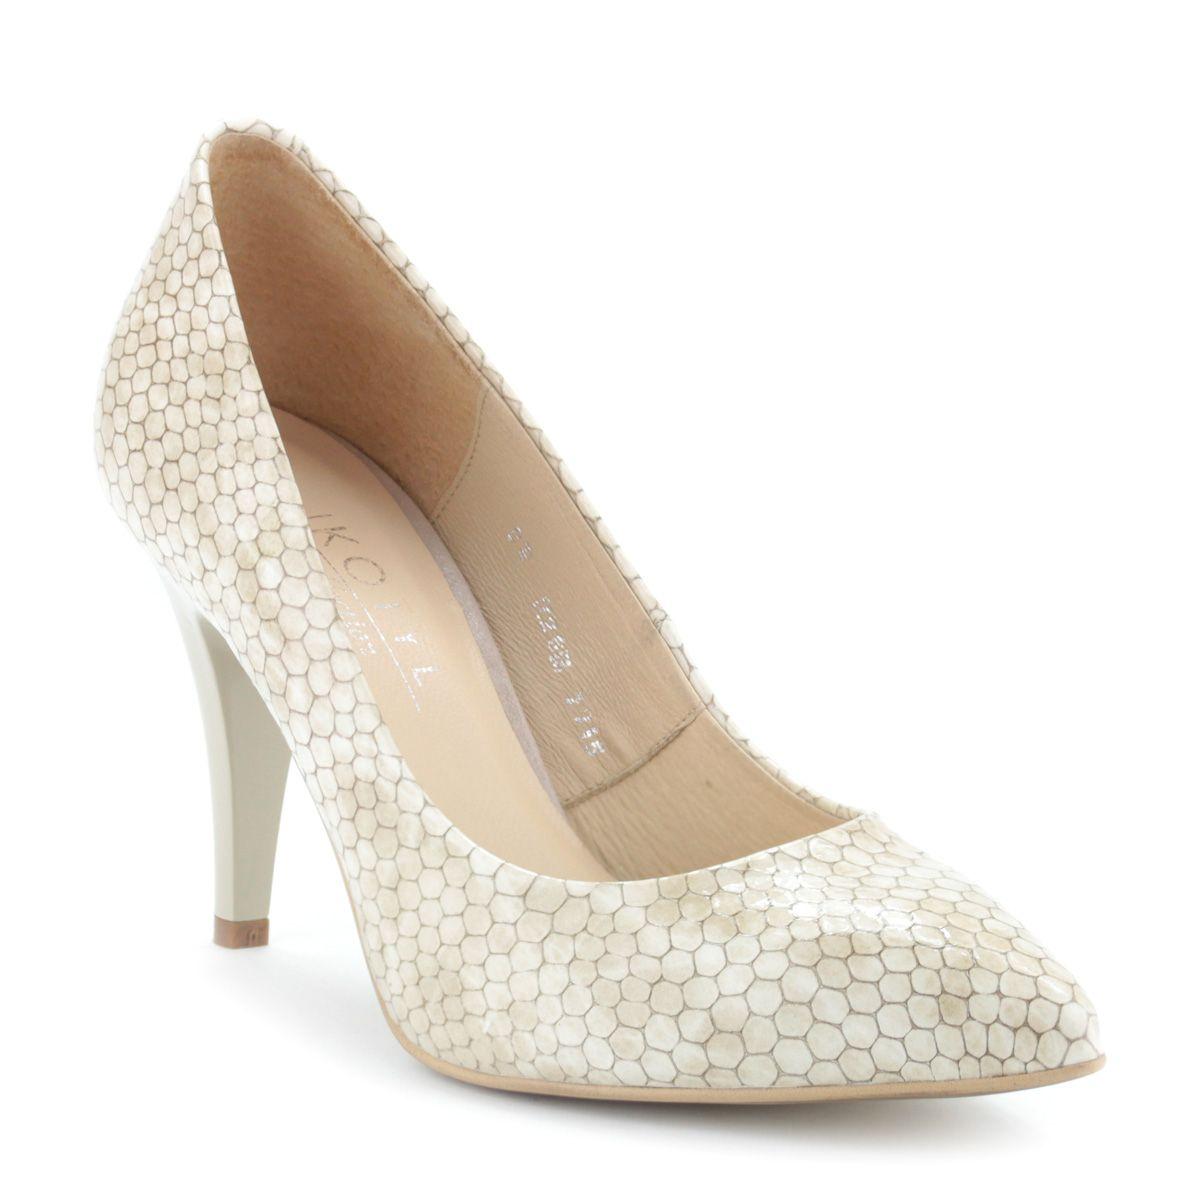 Magas sarkú női alkalmi cipő  cd9939a744